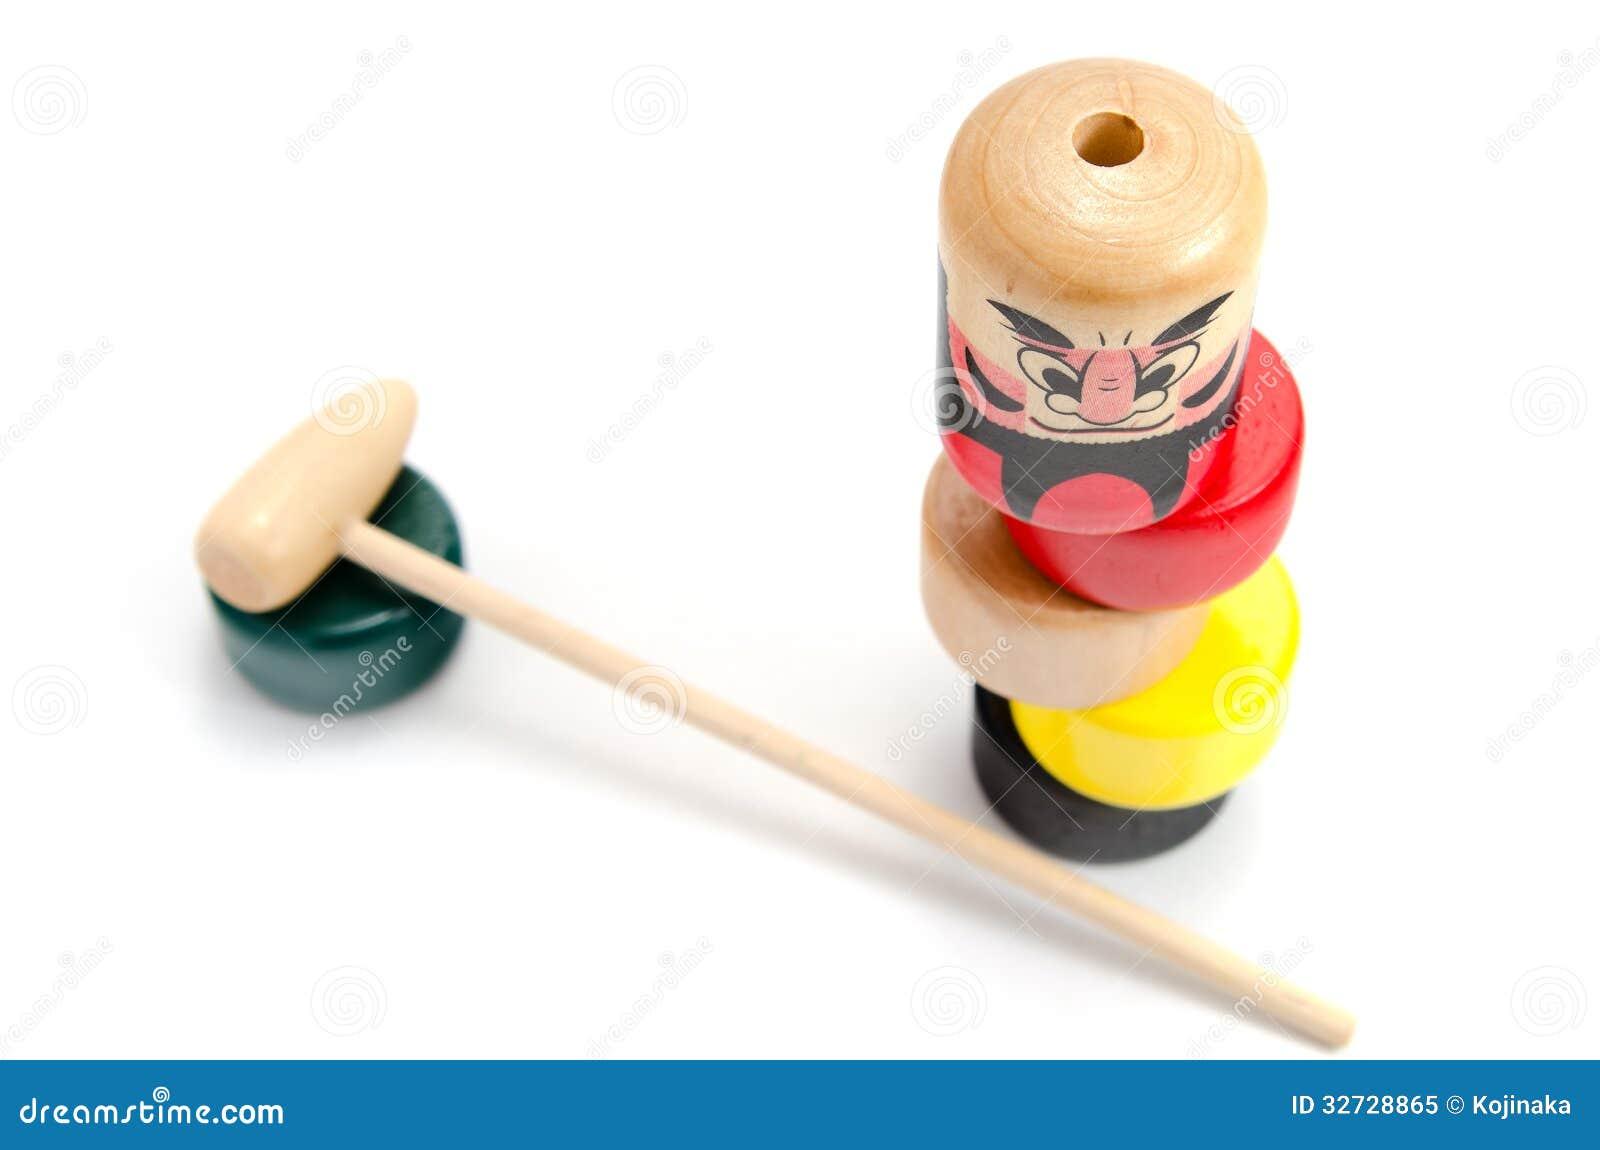 Japan Traditional Toys : Dharma drop daruma otoshi stock image